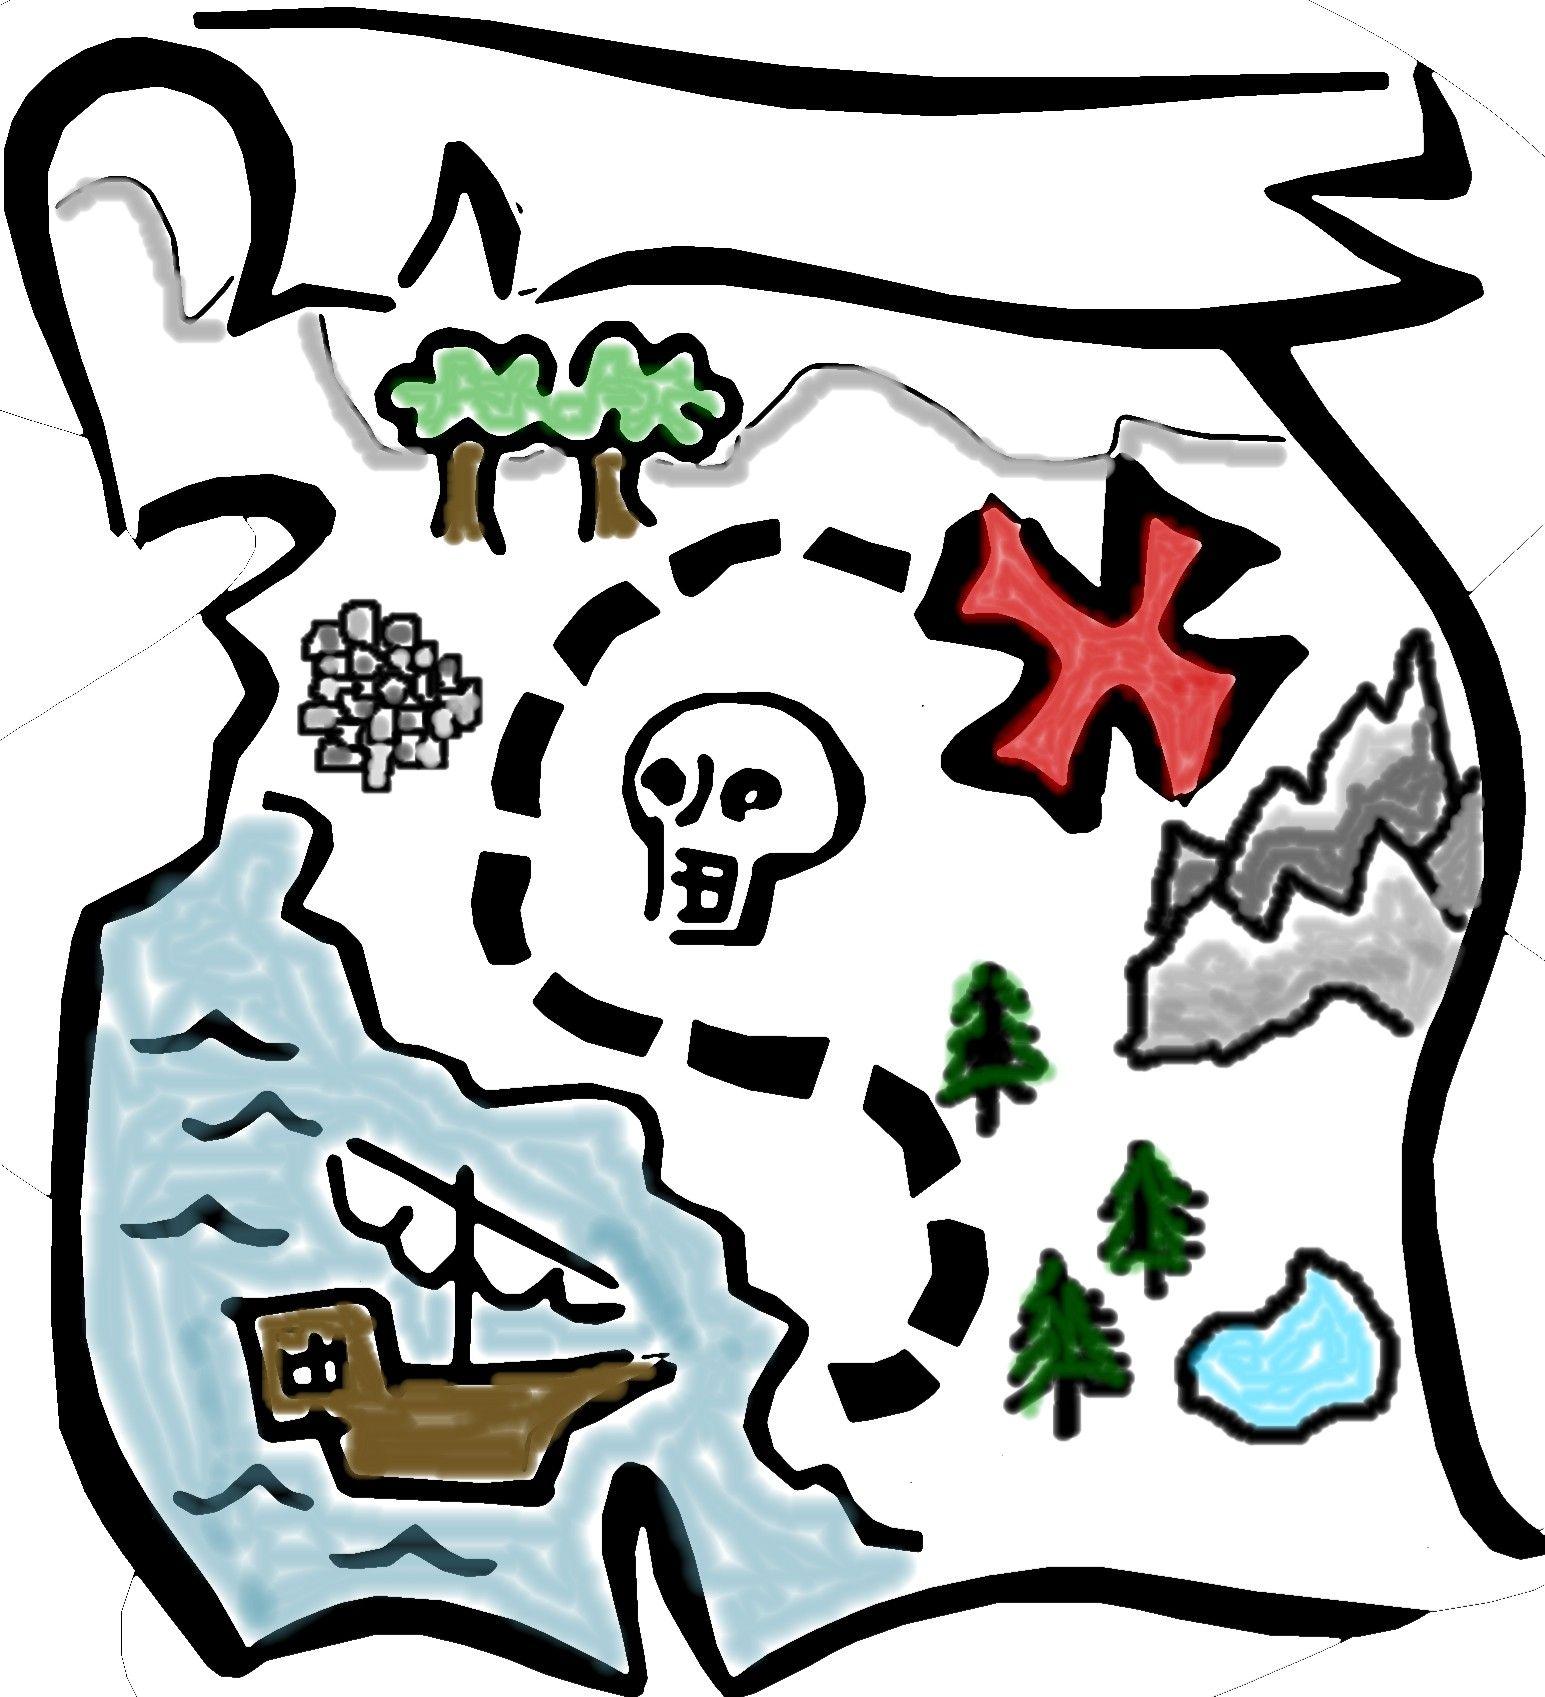 Clipart map. Maps incep imagine ex